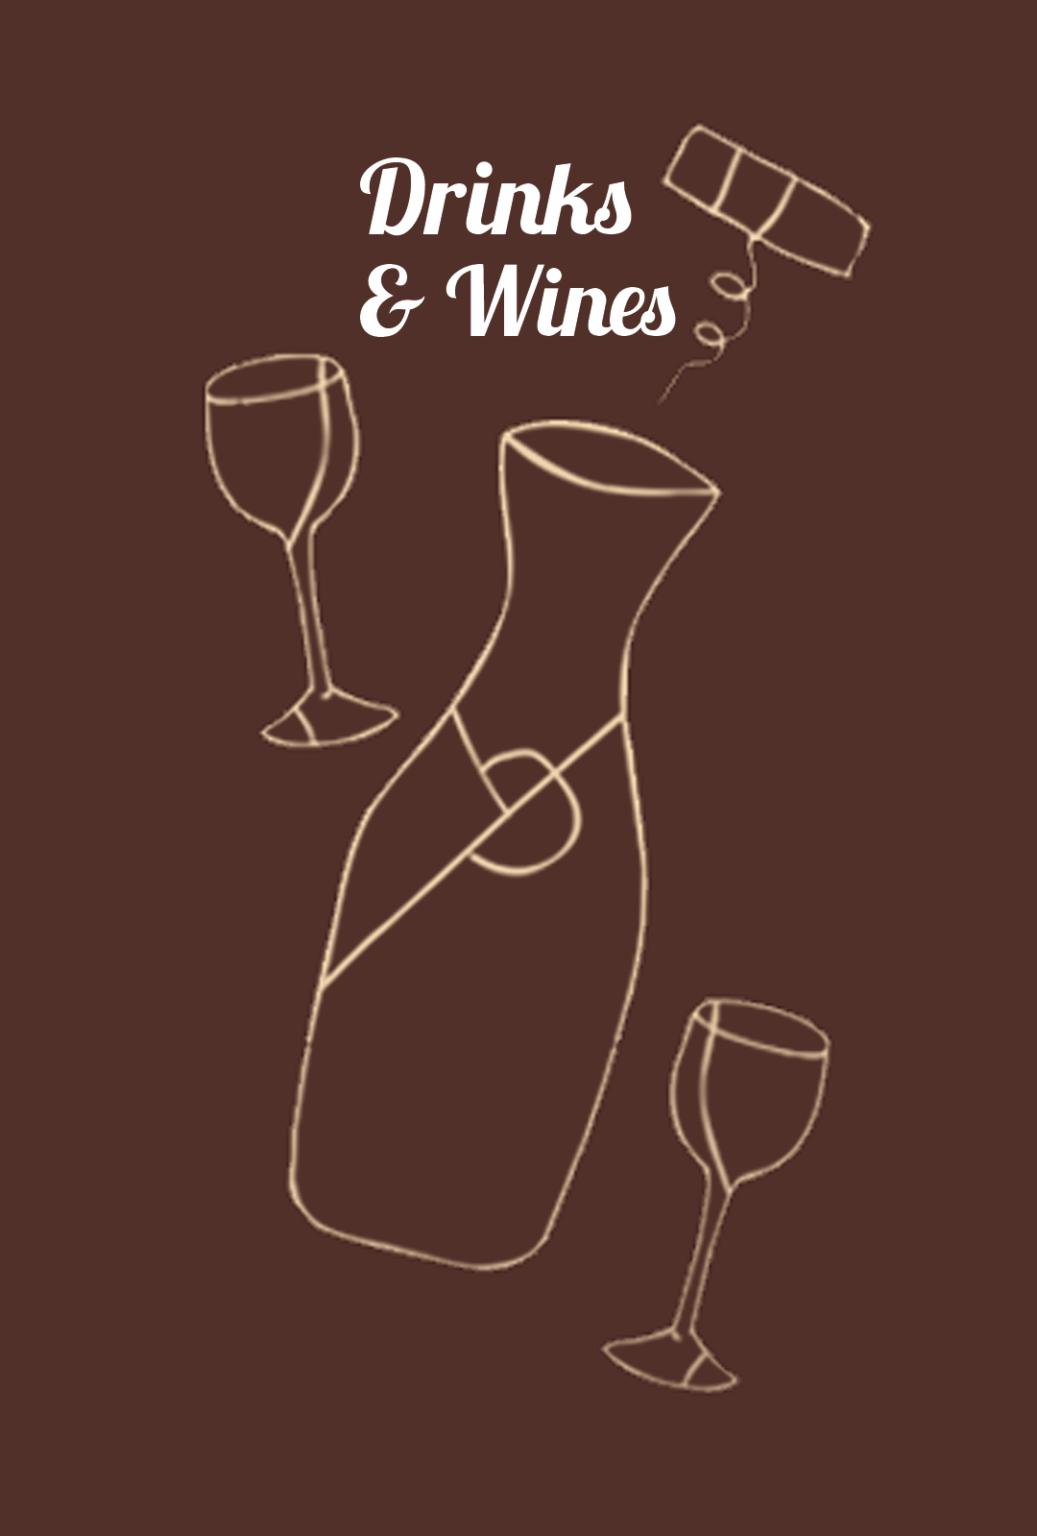 Drinks and Wines menu selector